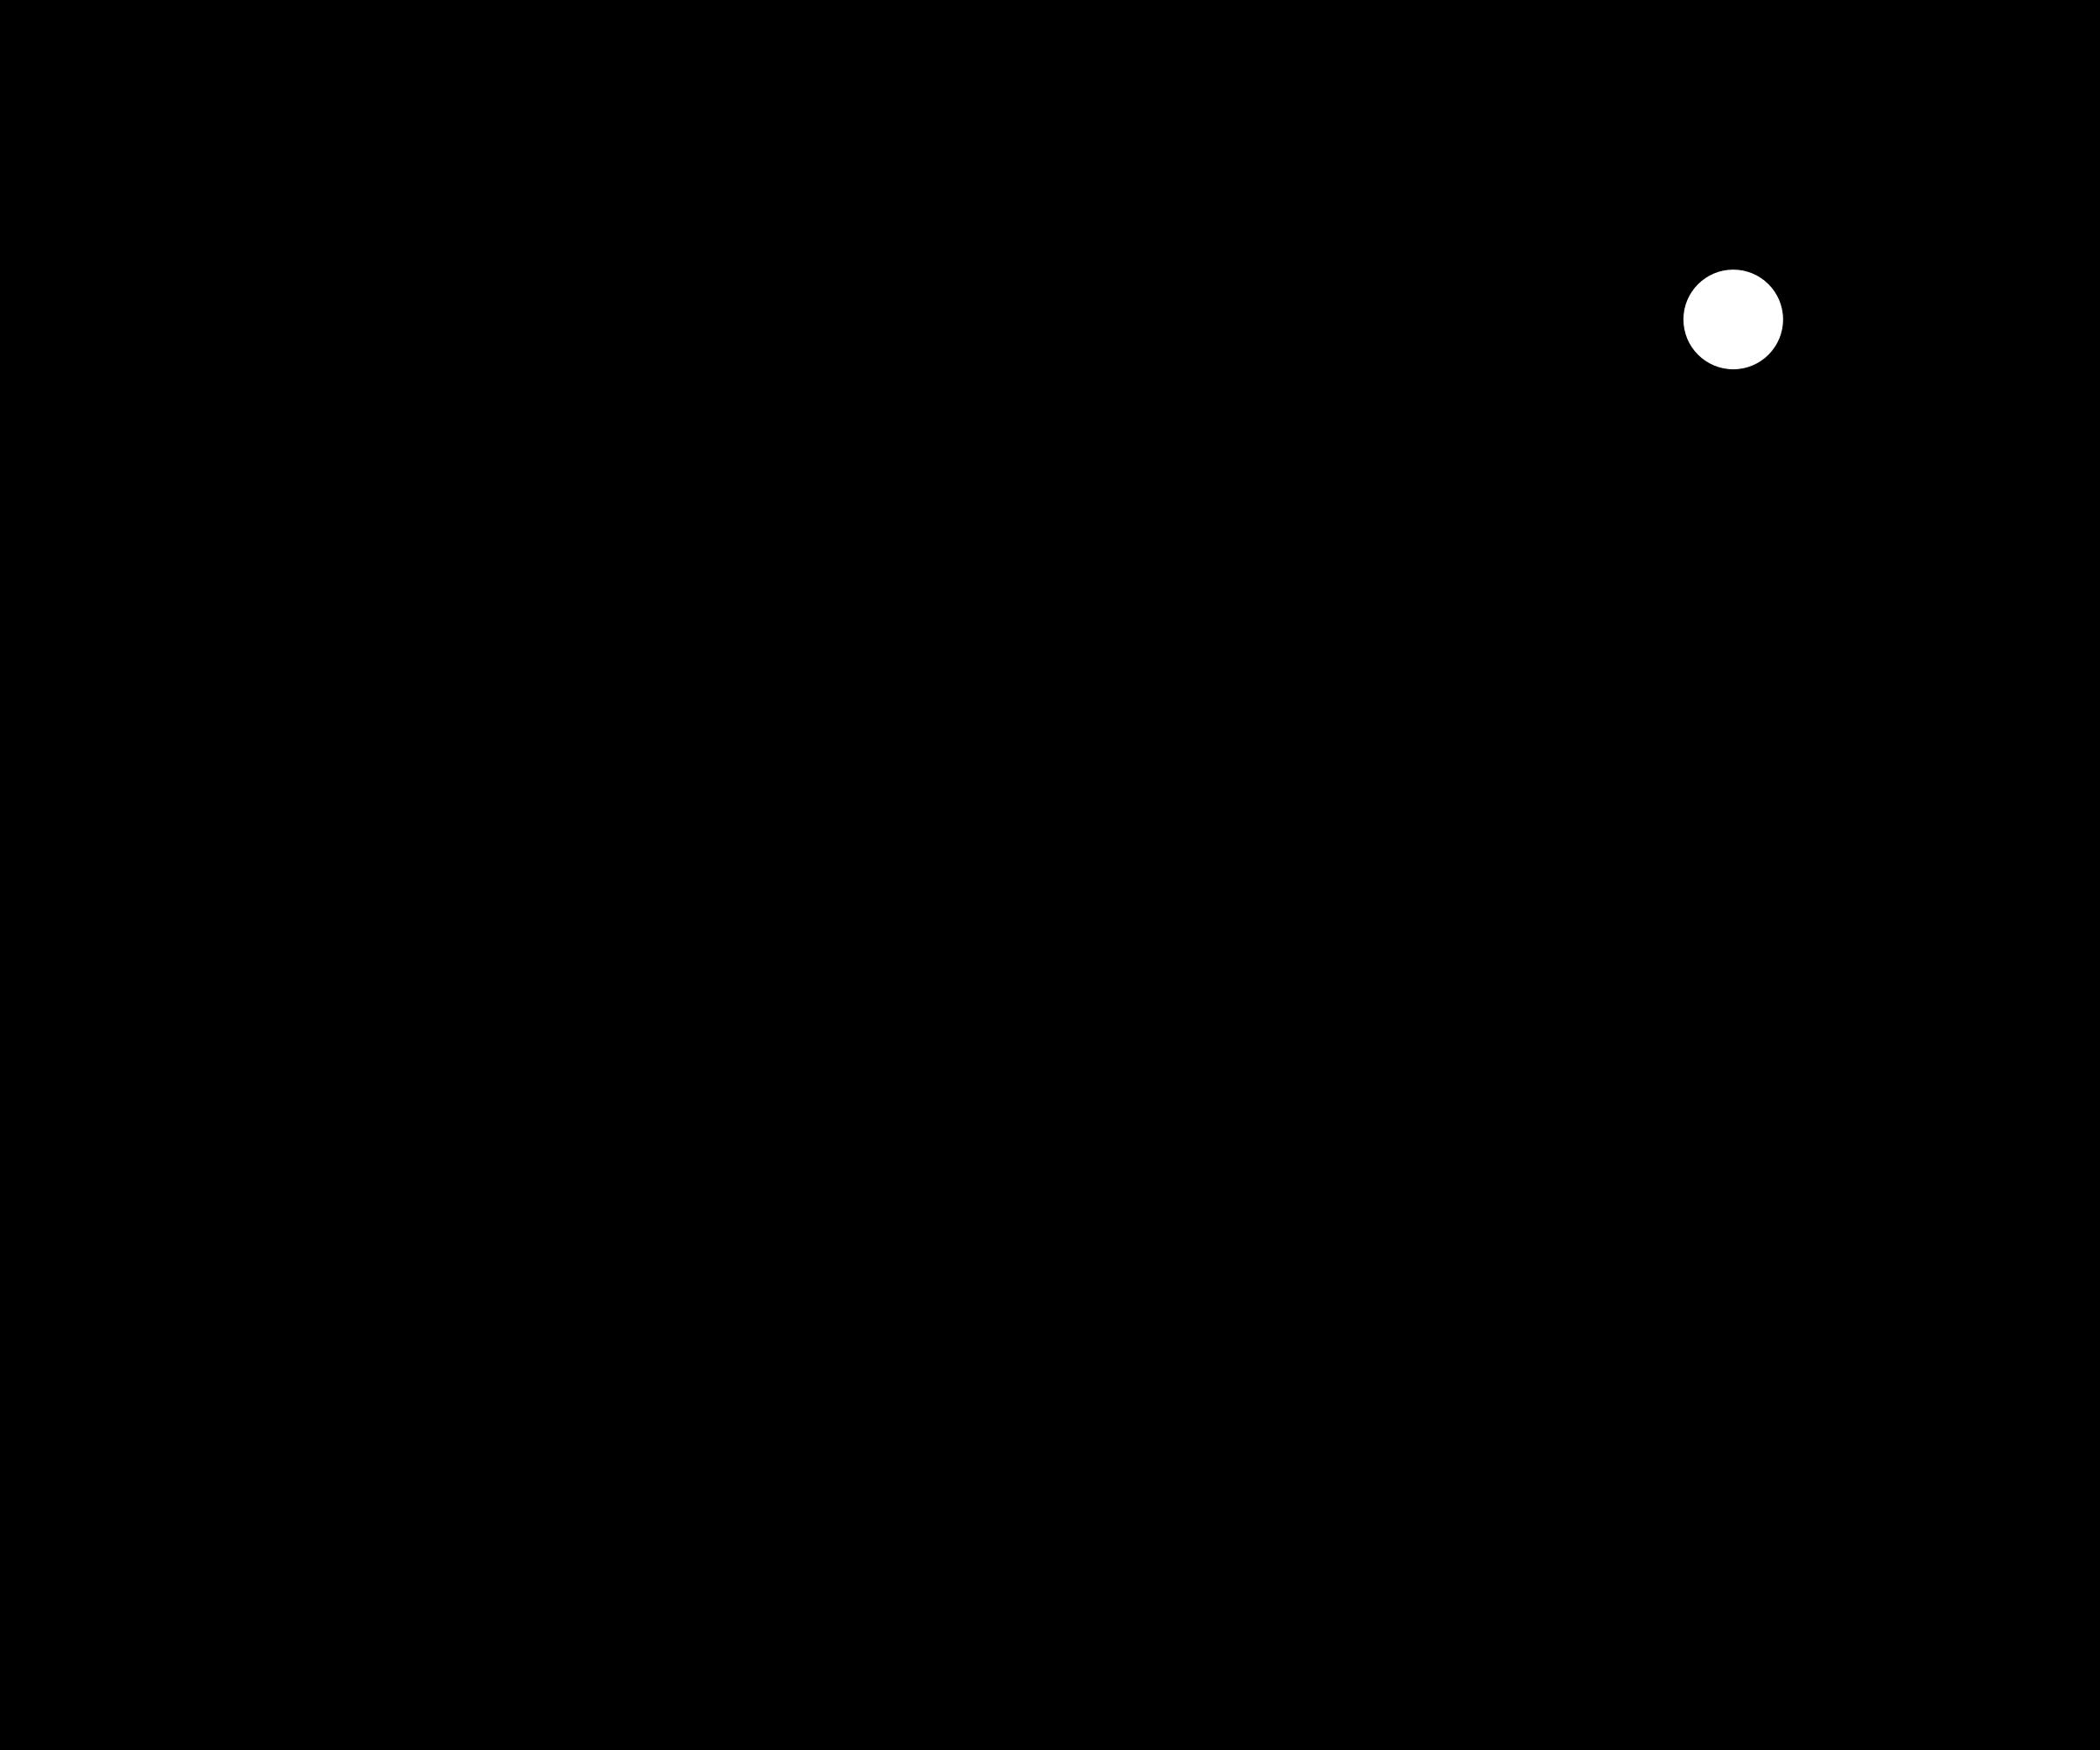 Astrology clipart leo Clipart symbol symbol Zodiac Zodiac